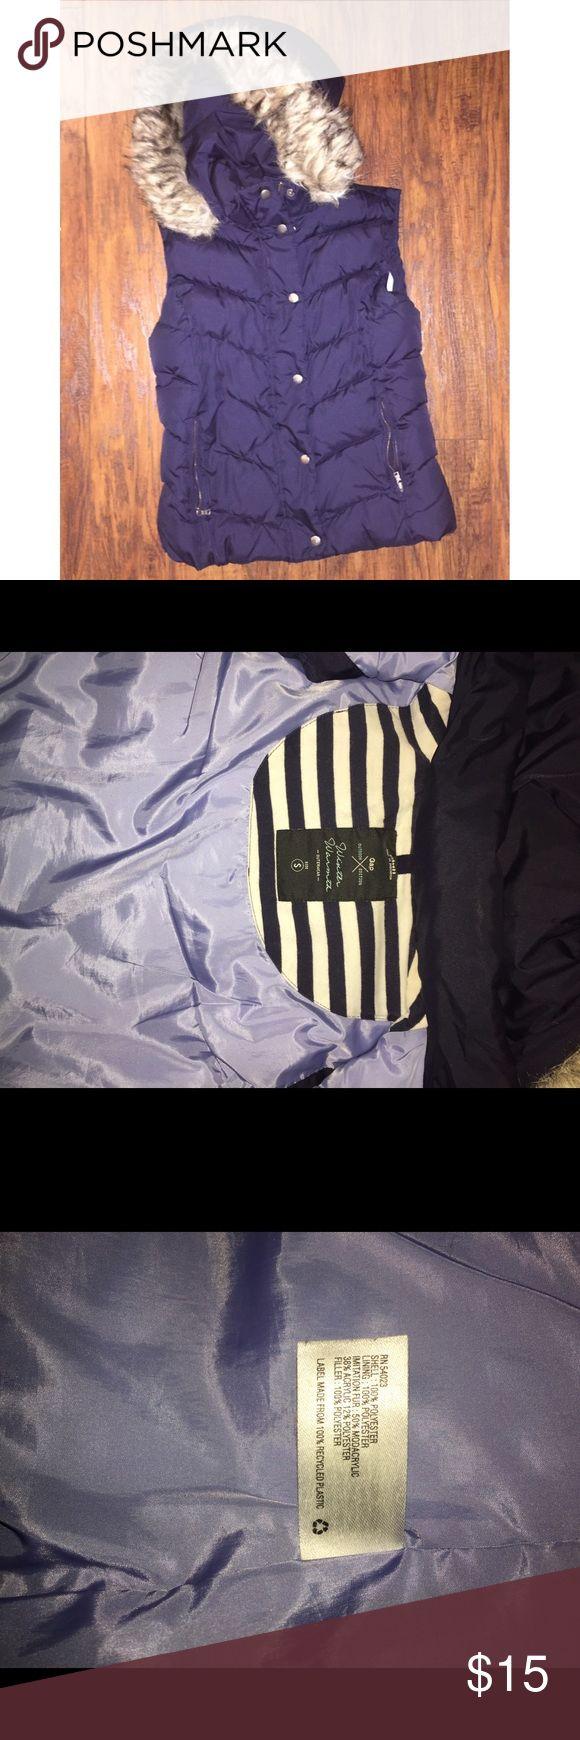 small navy puffy GAP vest with detachable hood small navy blue puffy GAP vest with detachable hood, faux fur detail GAP Jackets & Coats Vests